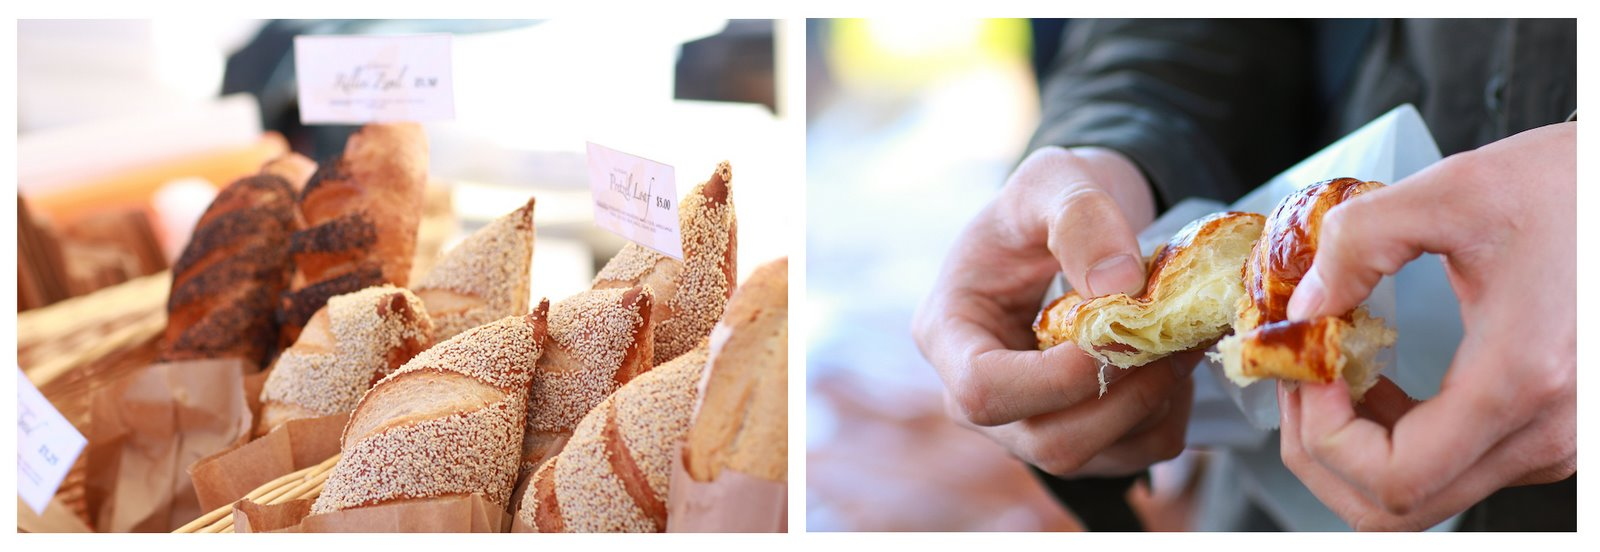 Davis Farmers Market Bread Croissant